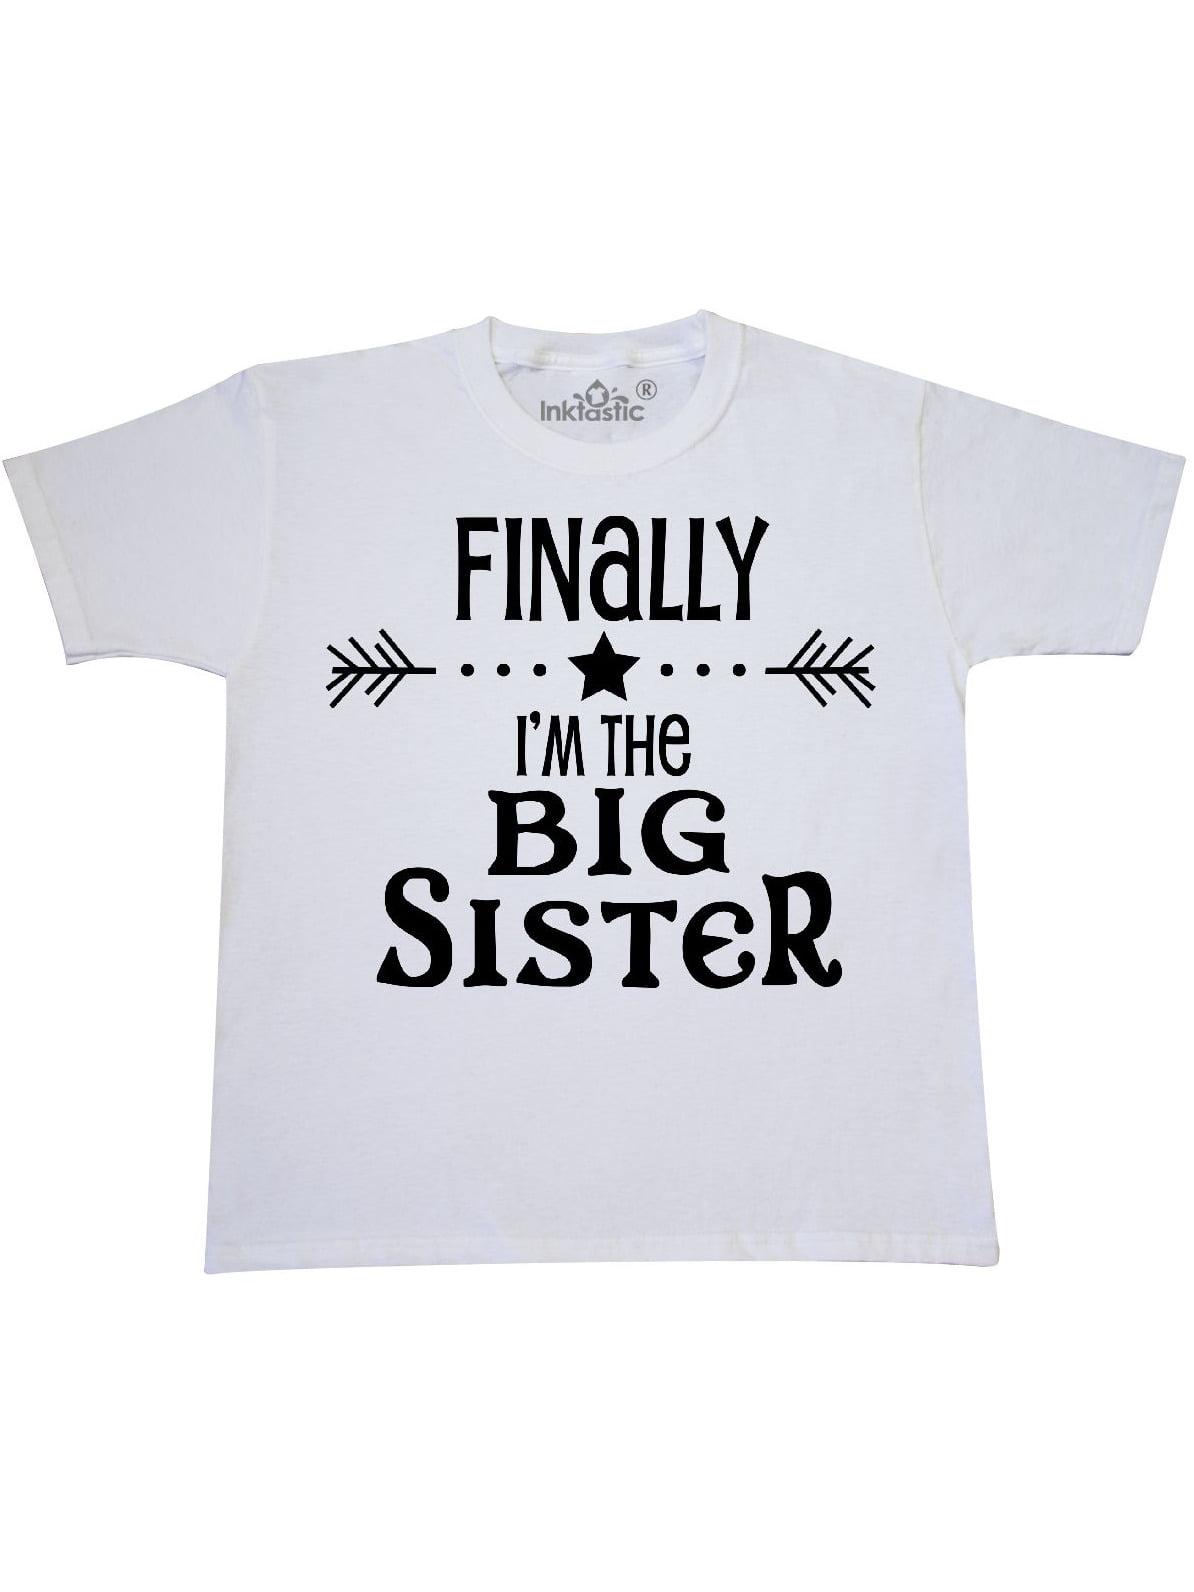 Finally I'm the Big Sister Youth T-Shirt